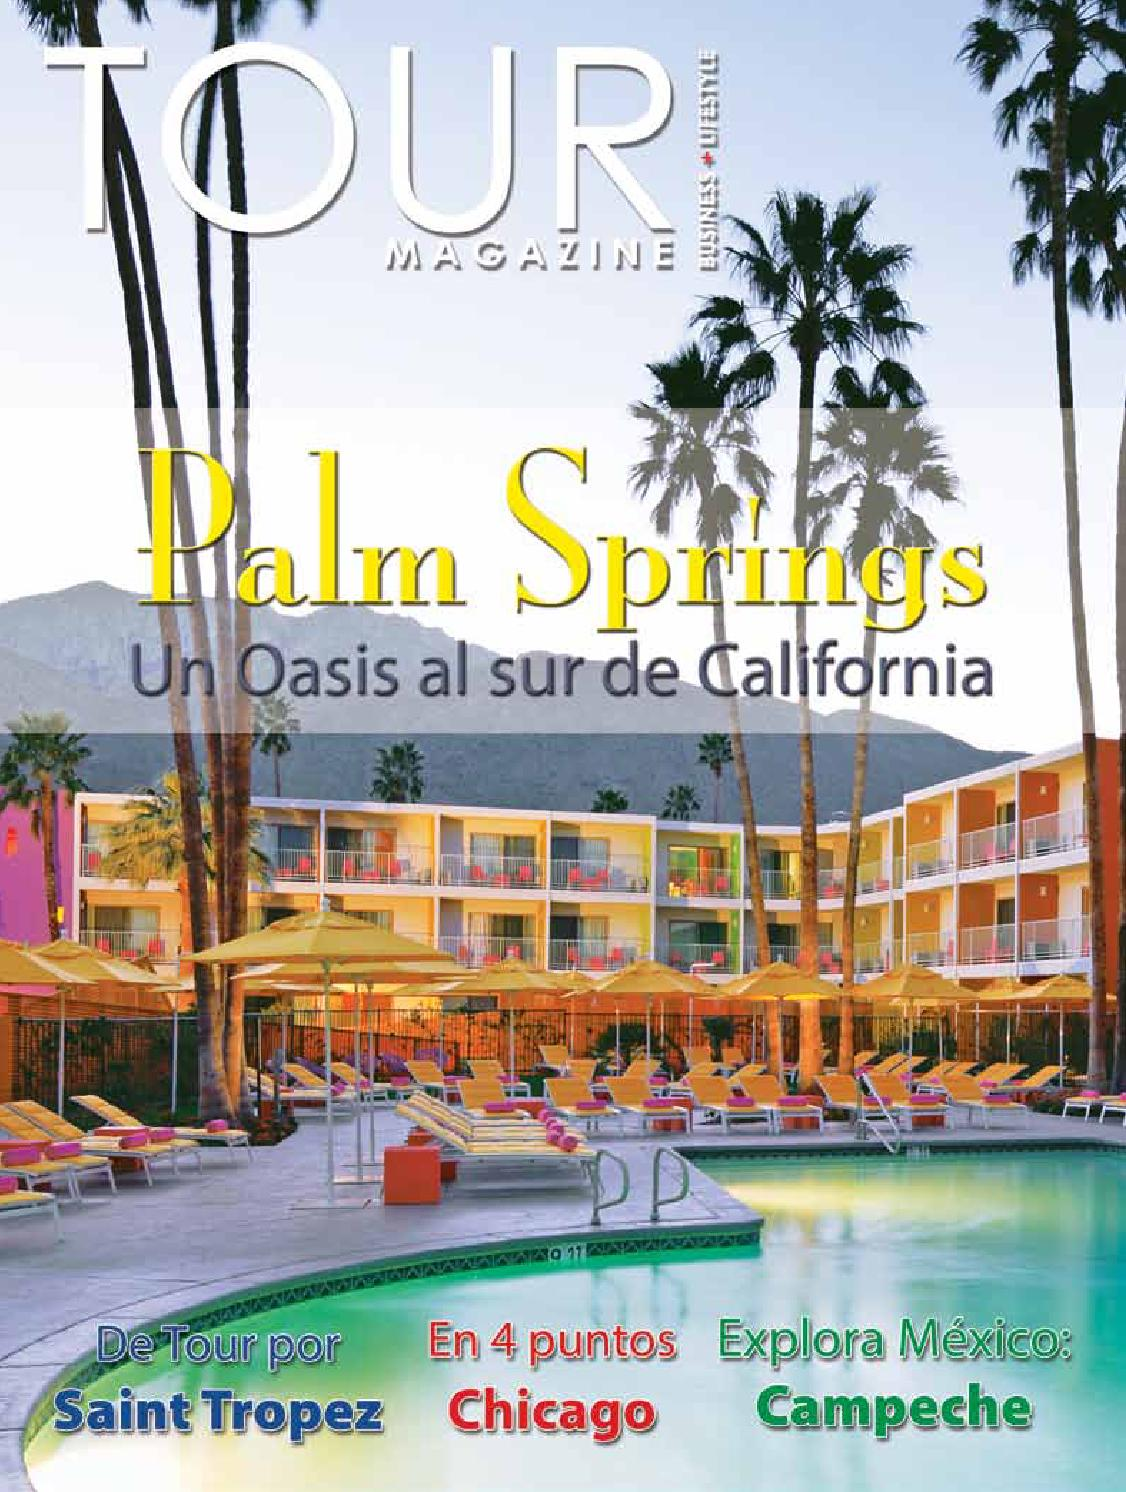 Palm Springs Edición 8 by TOUR MAGAZINE - issuu